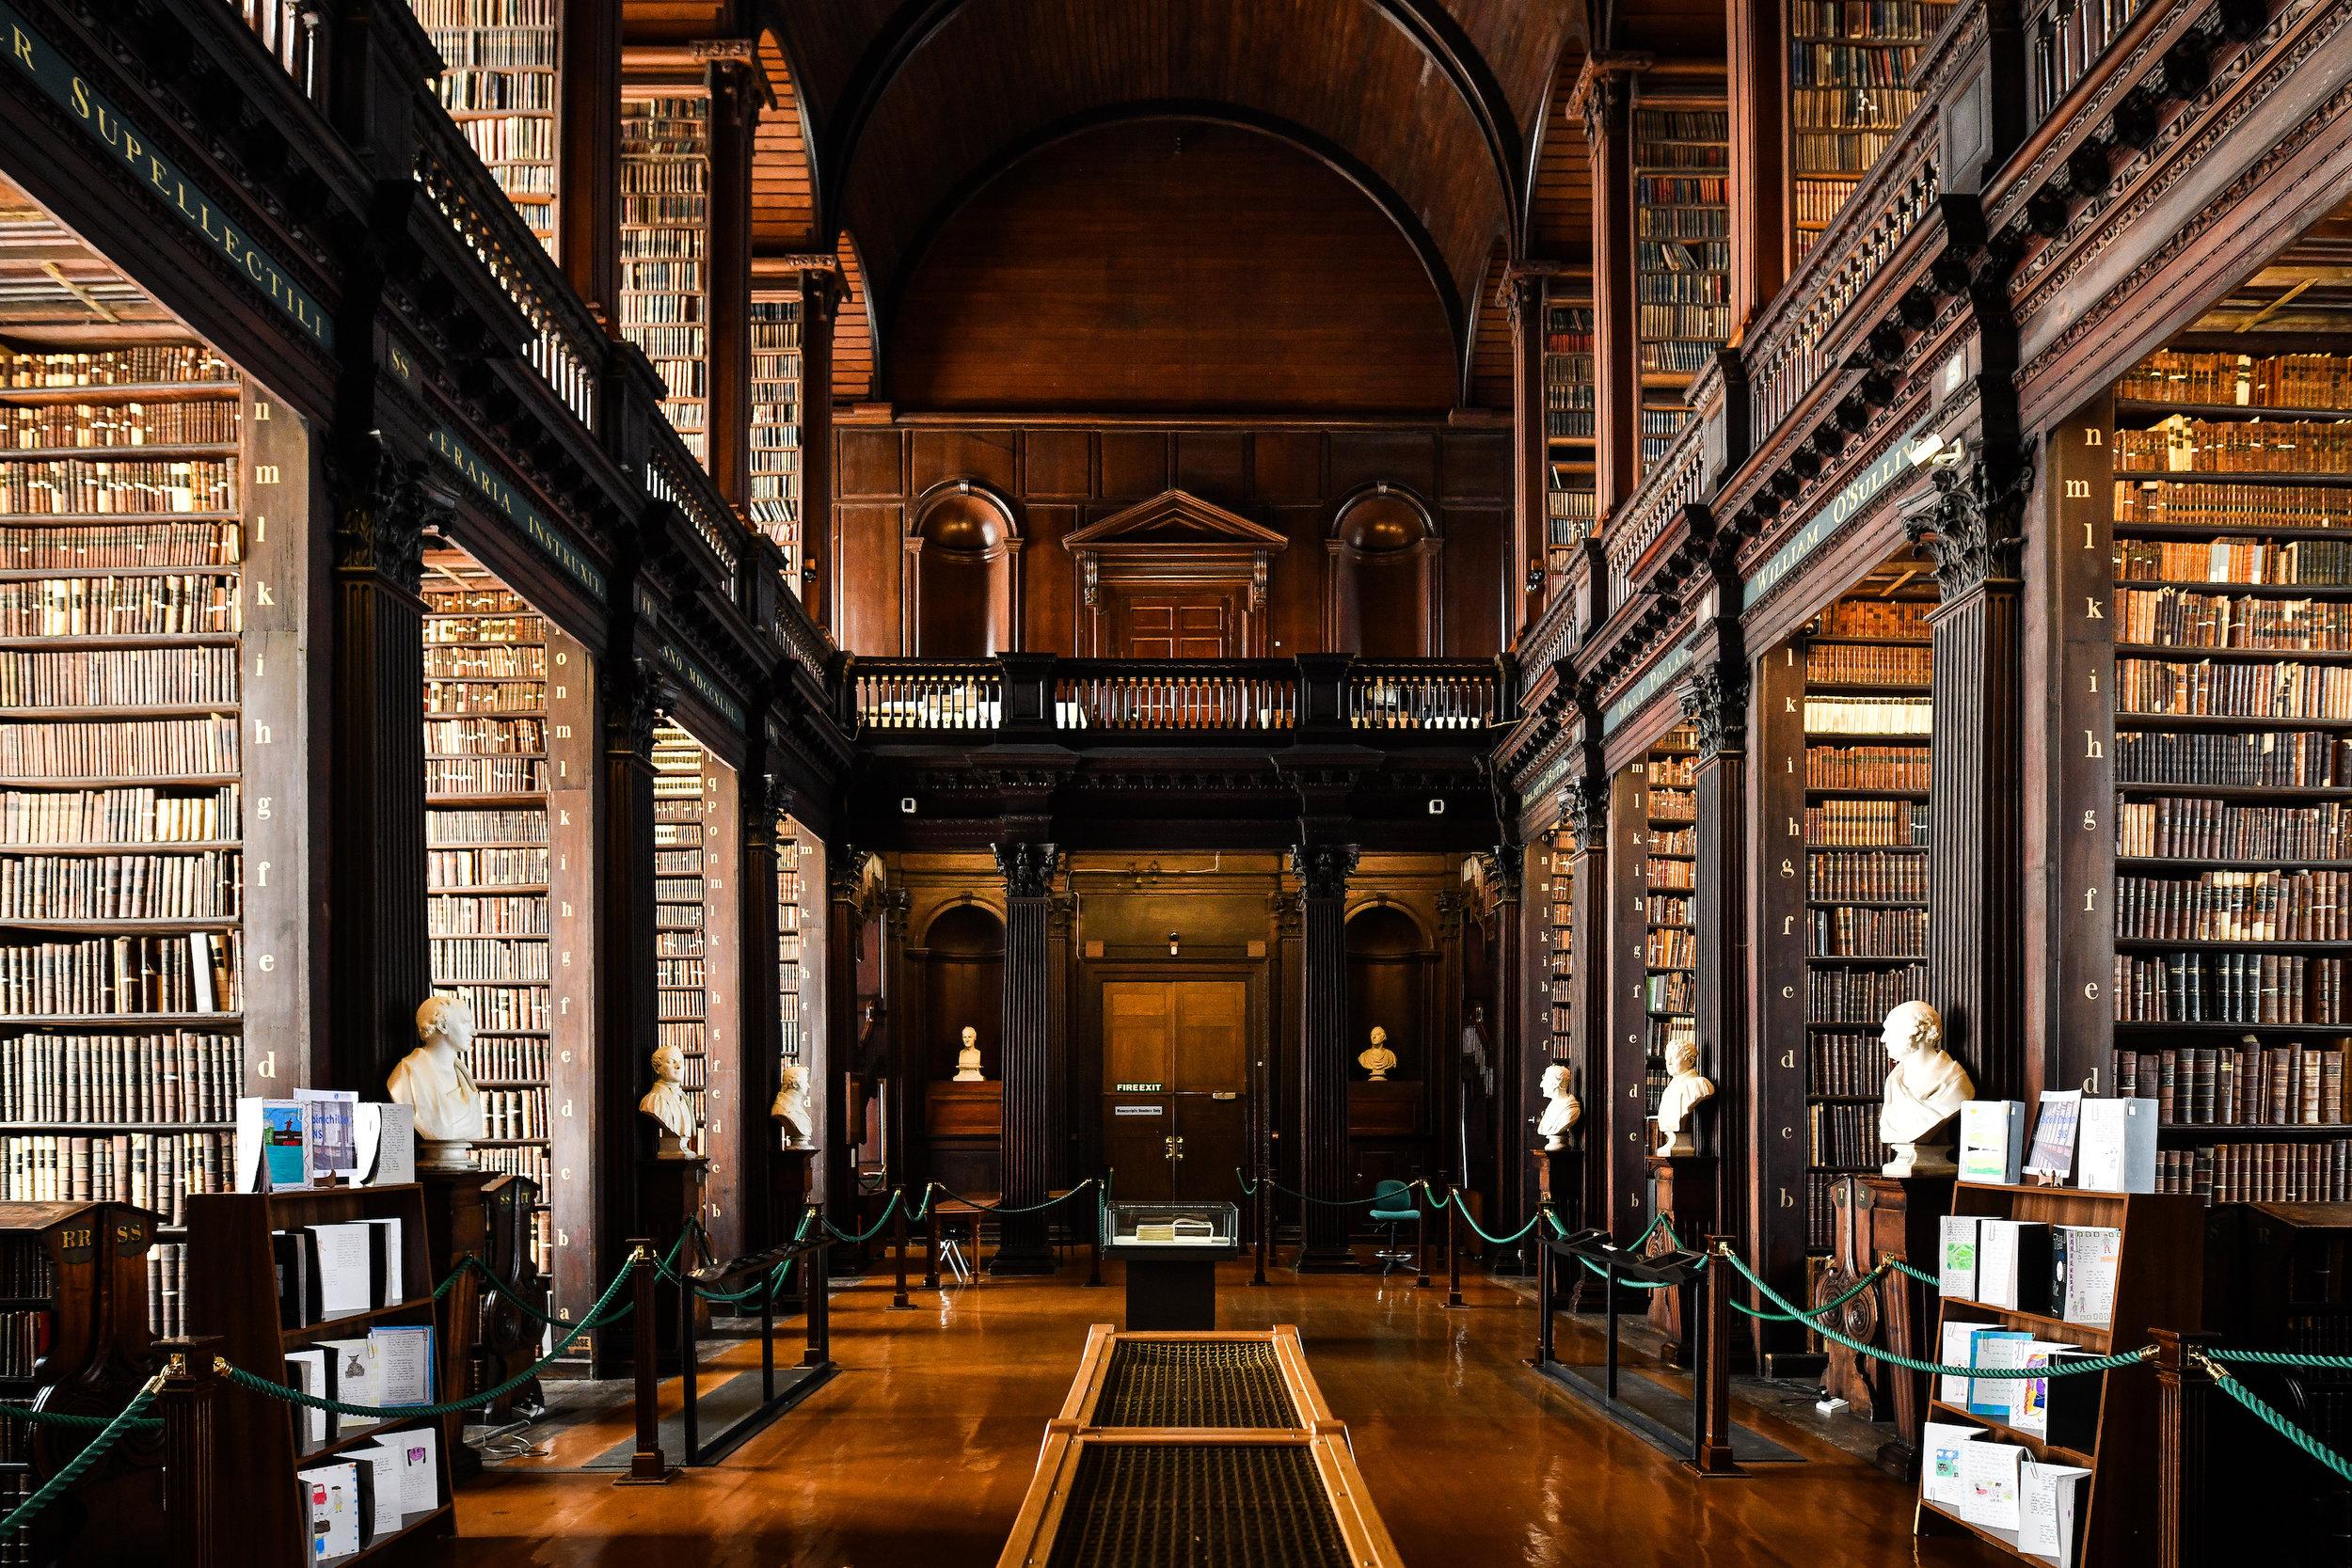 The beautiful trinity library in Dublin